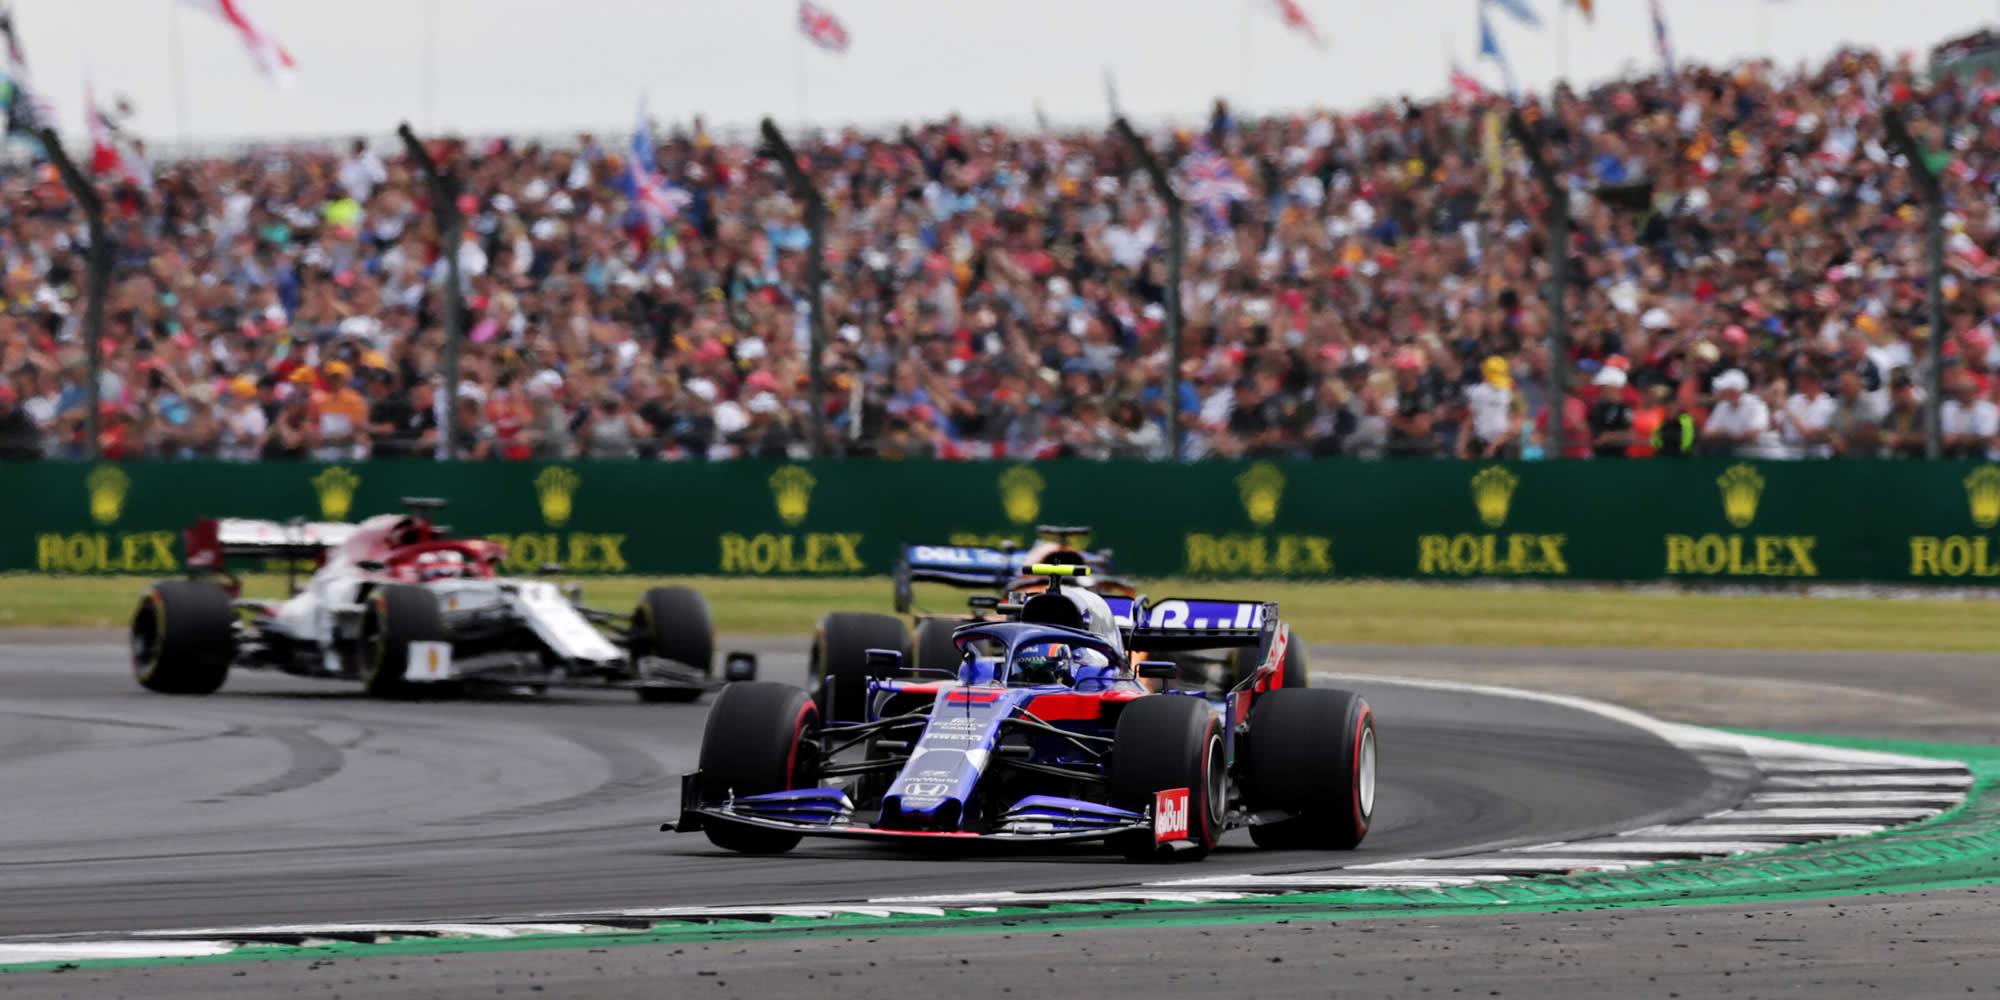 2019 British GP – Gallery 3